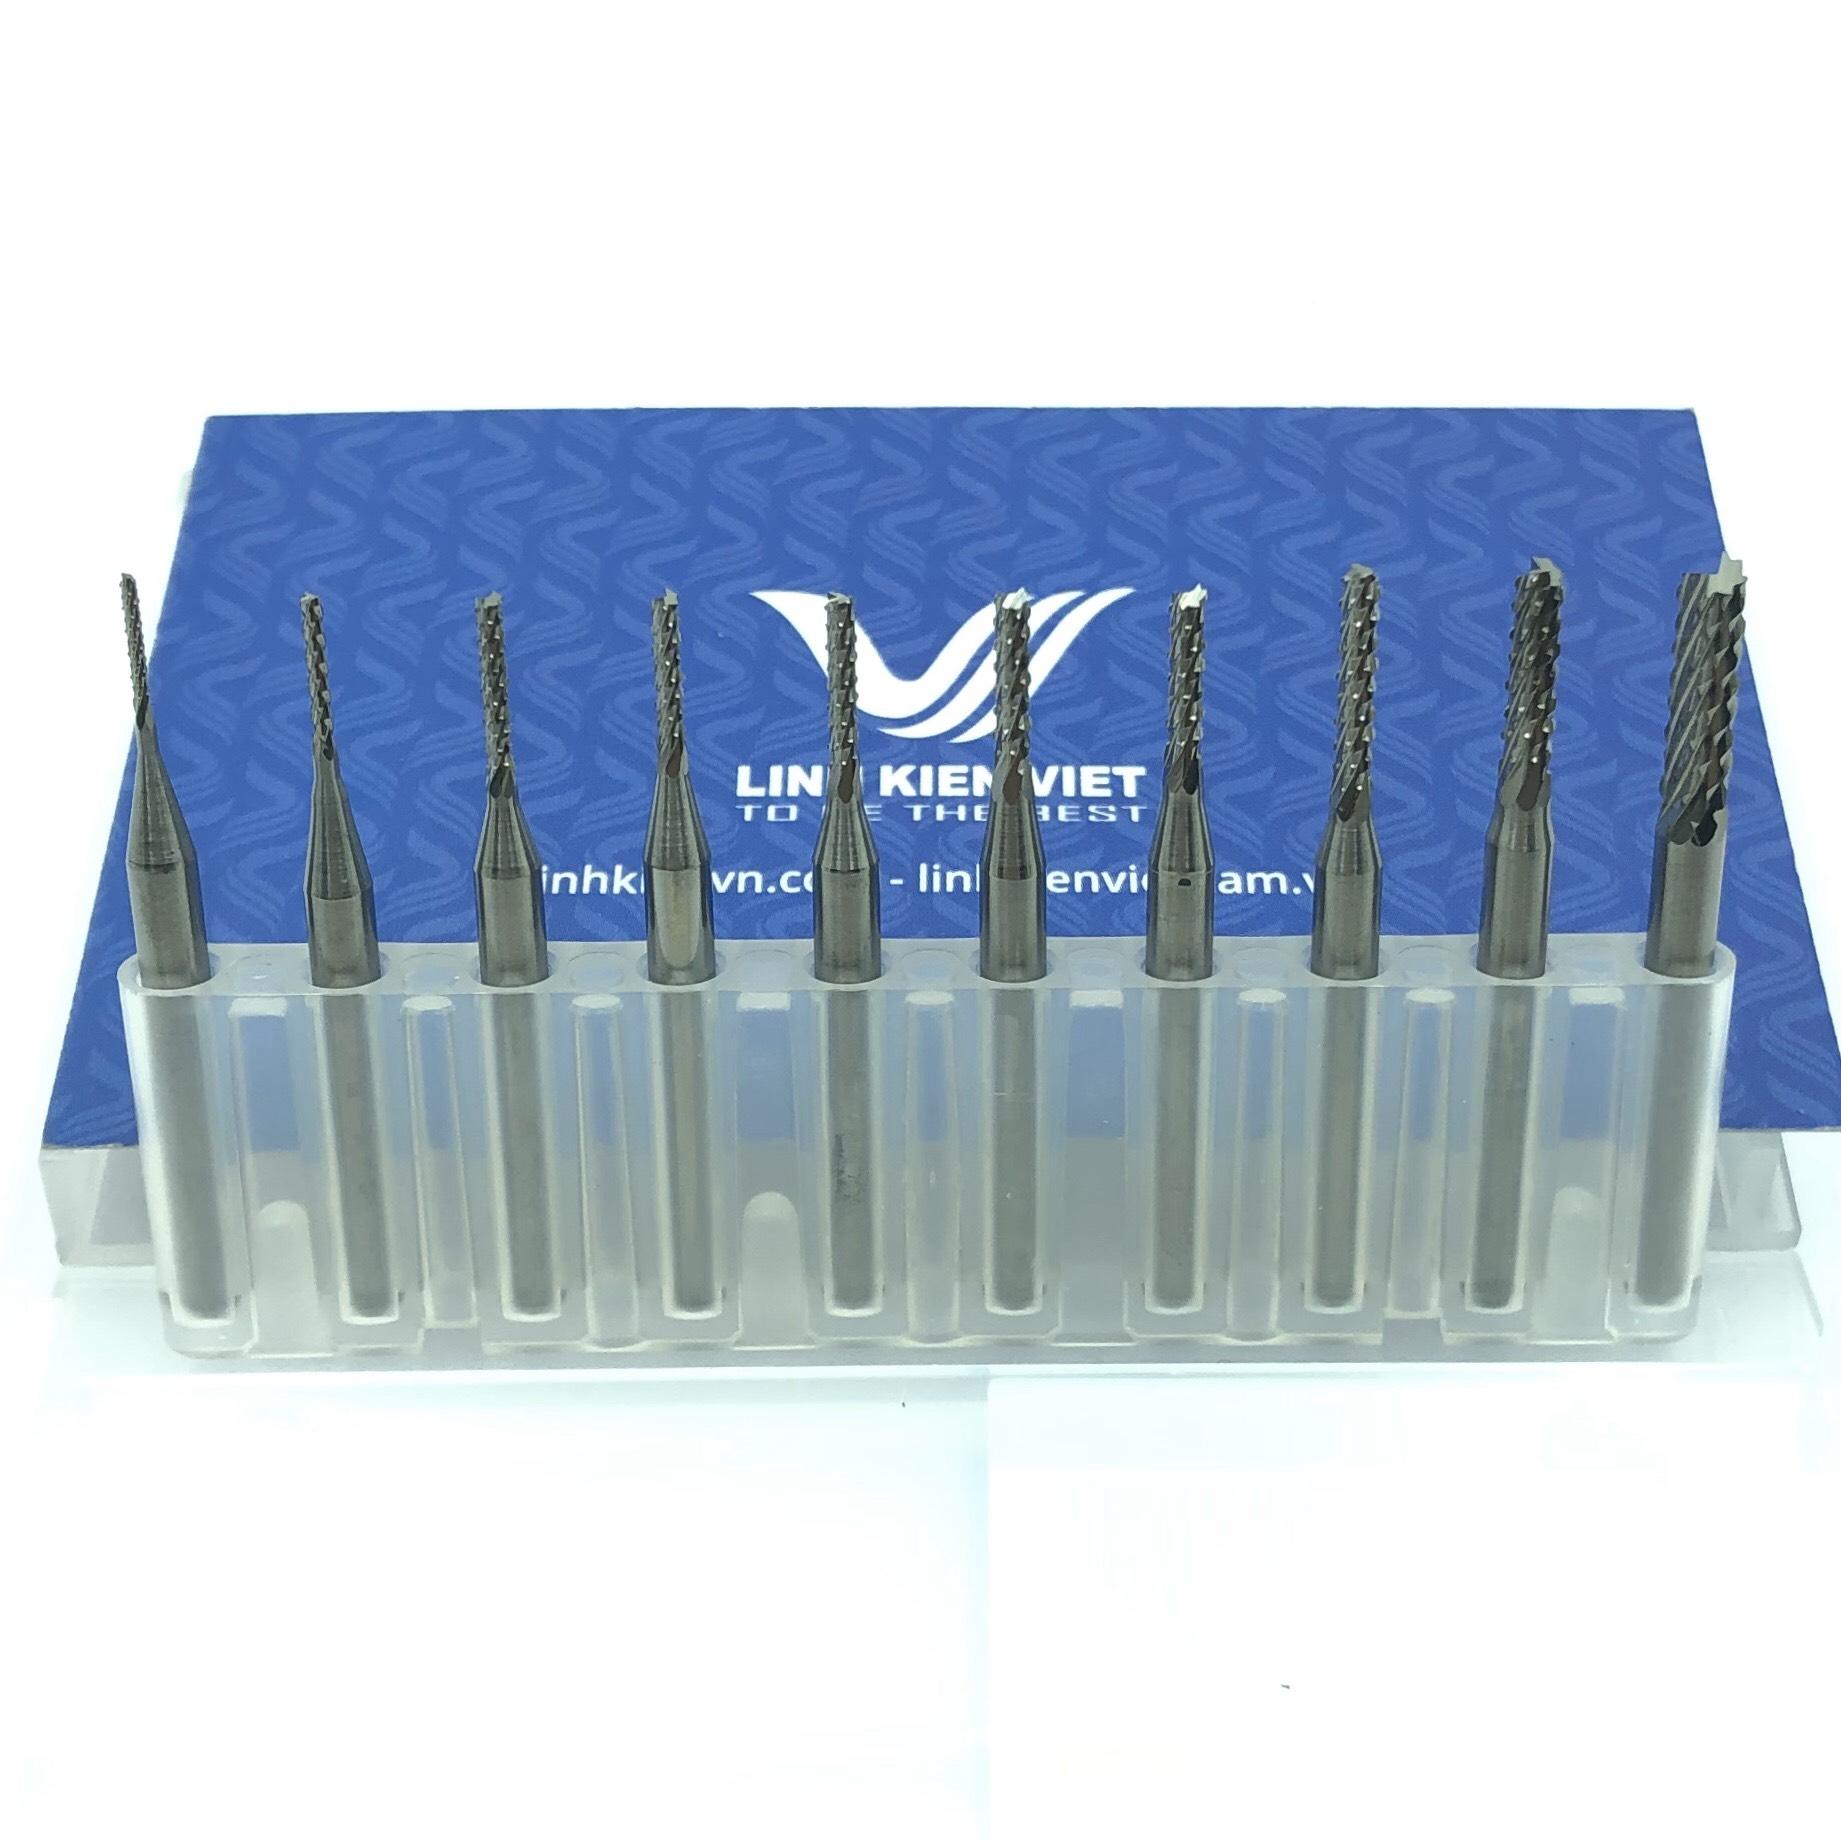 Combo 10 mũi phay CNC vonfram từ 0.8-3.175mm / S2H21